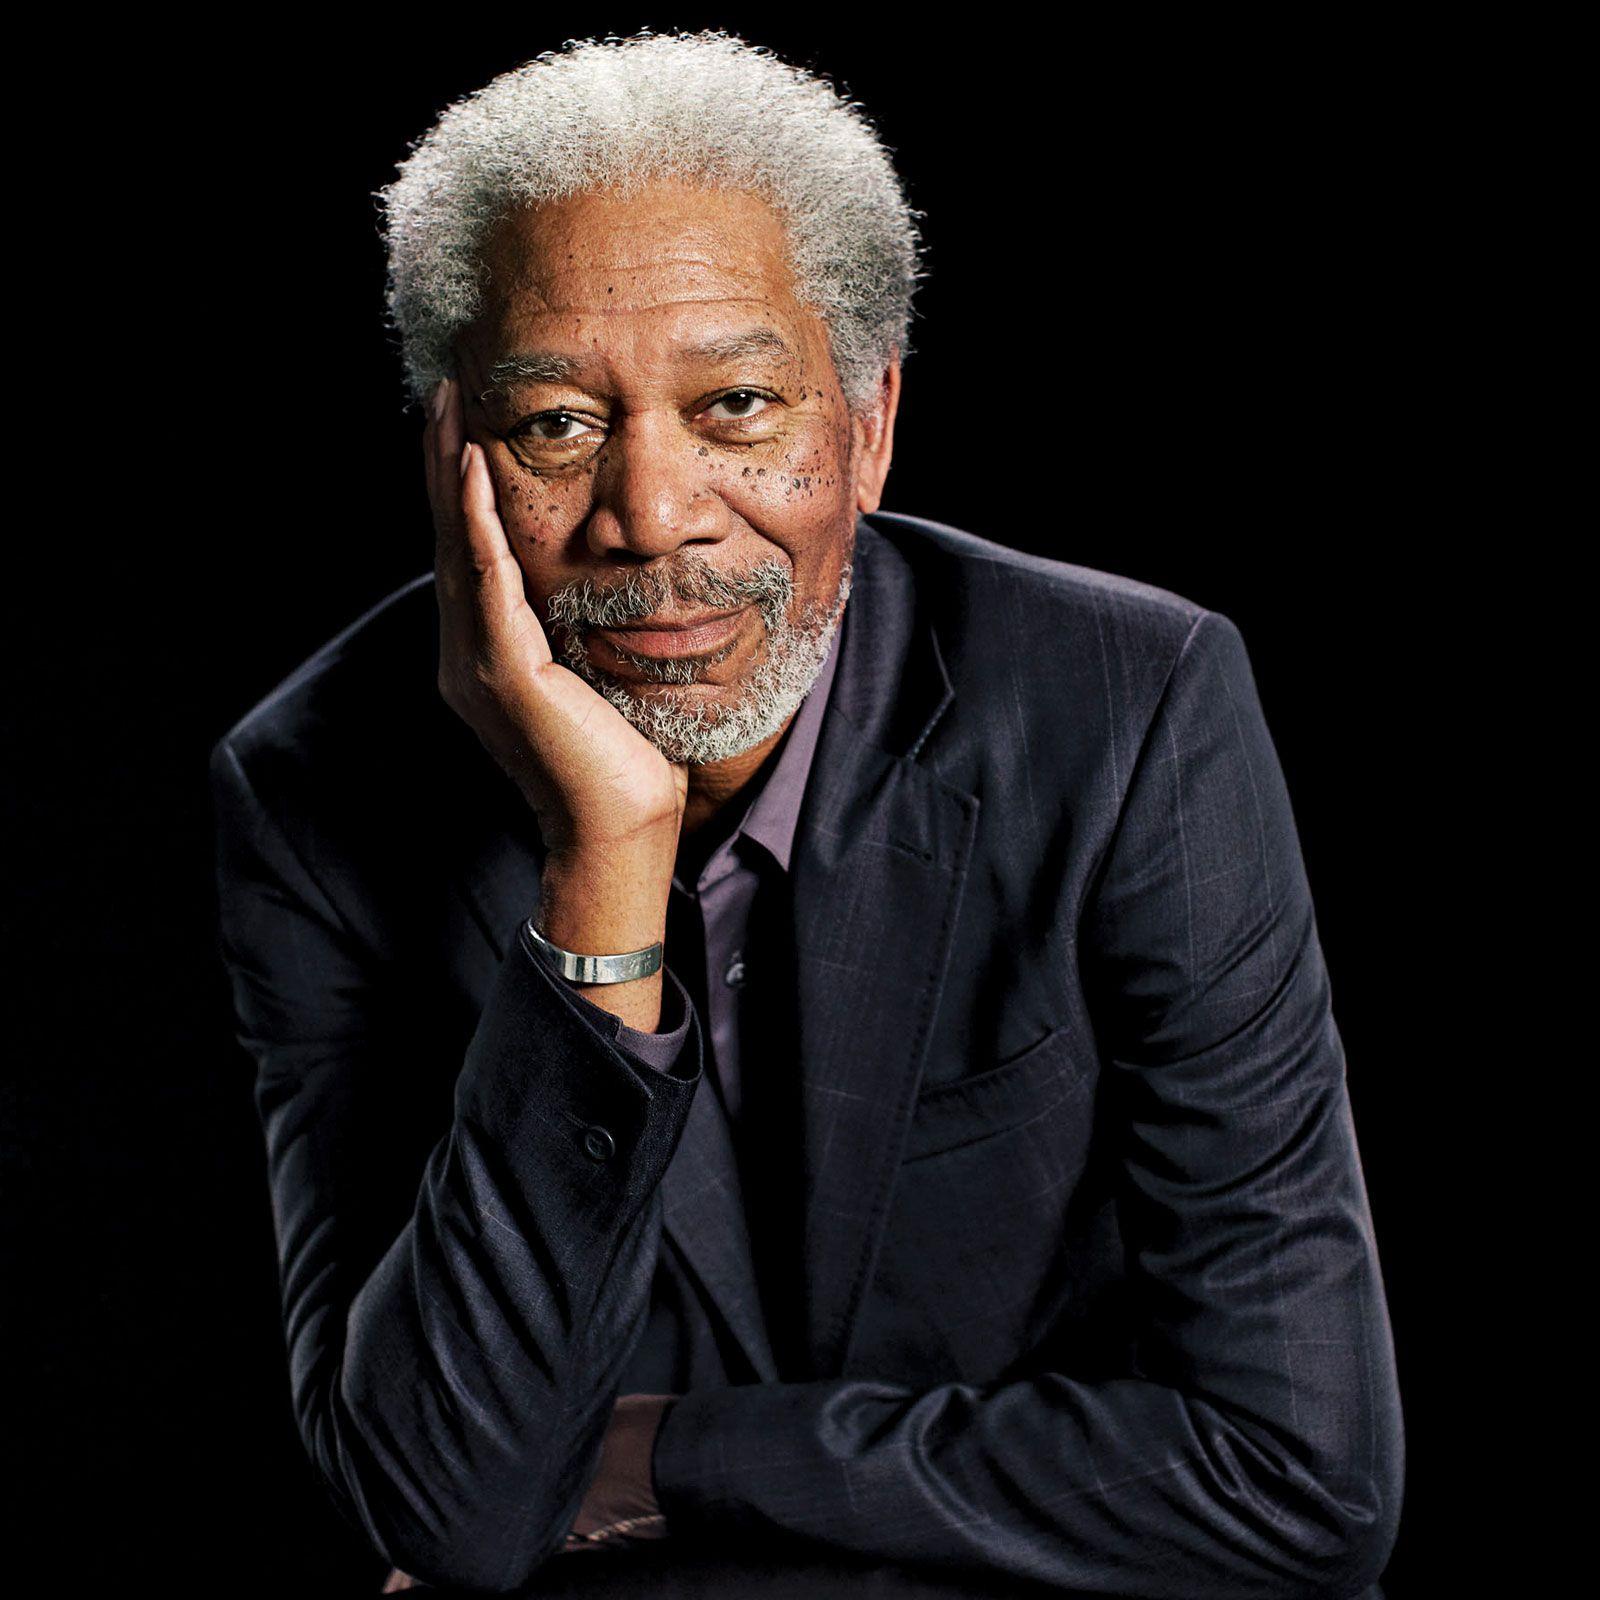 Morgan Freeman   Biography, Movies, Plays, & Facts   Britannica